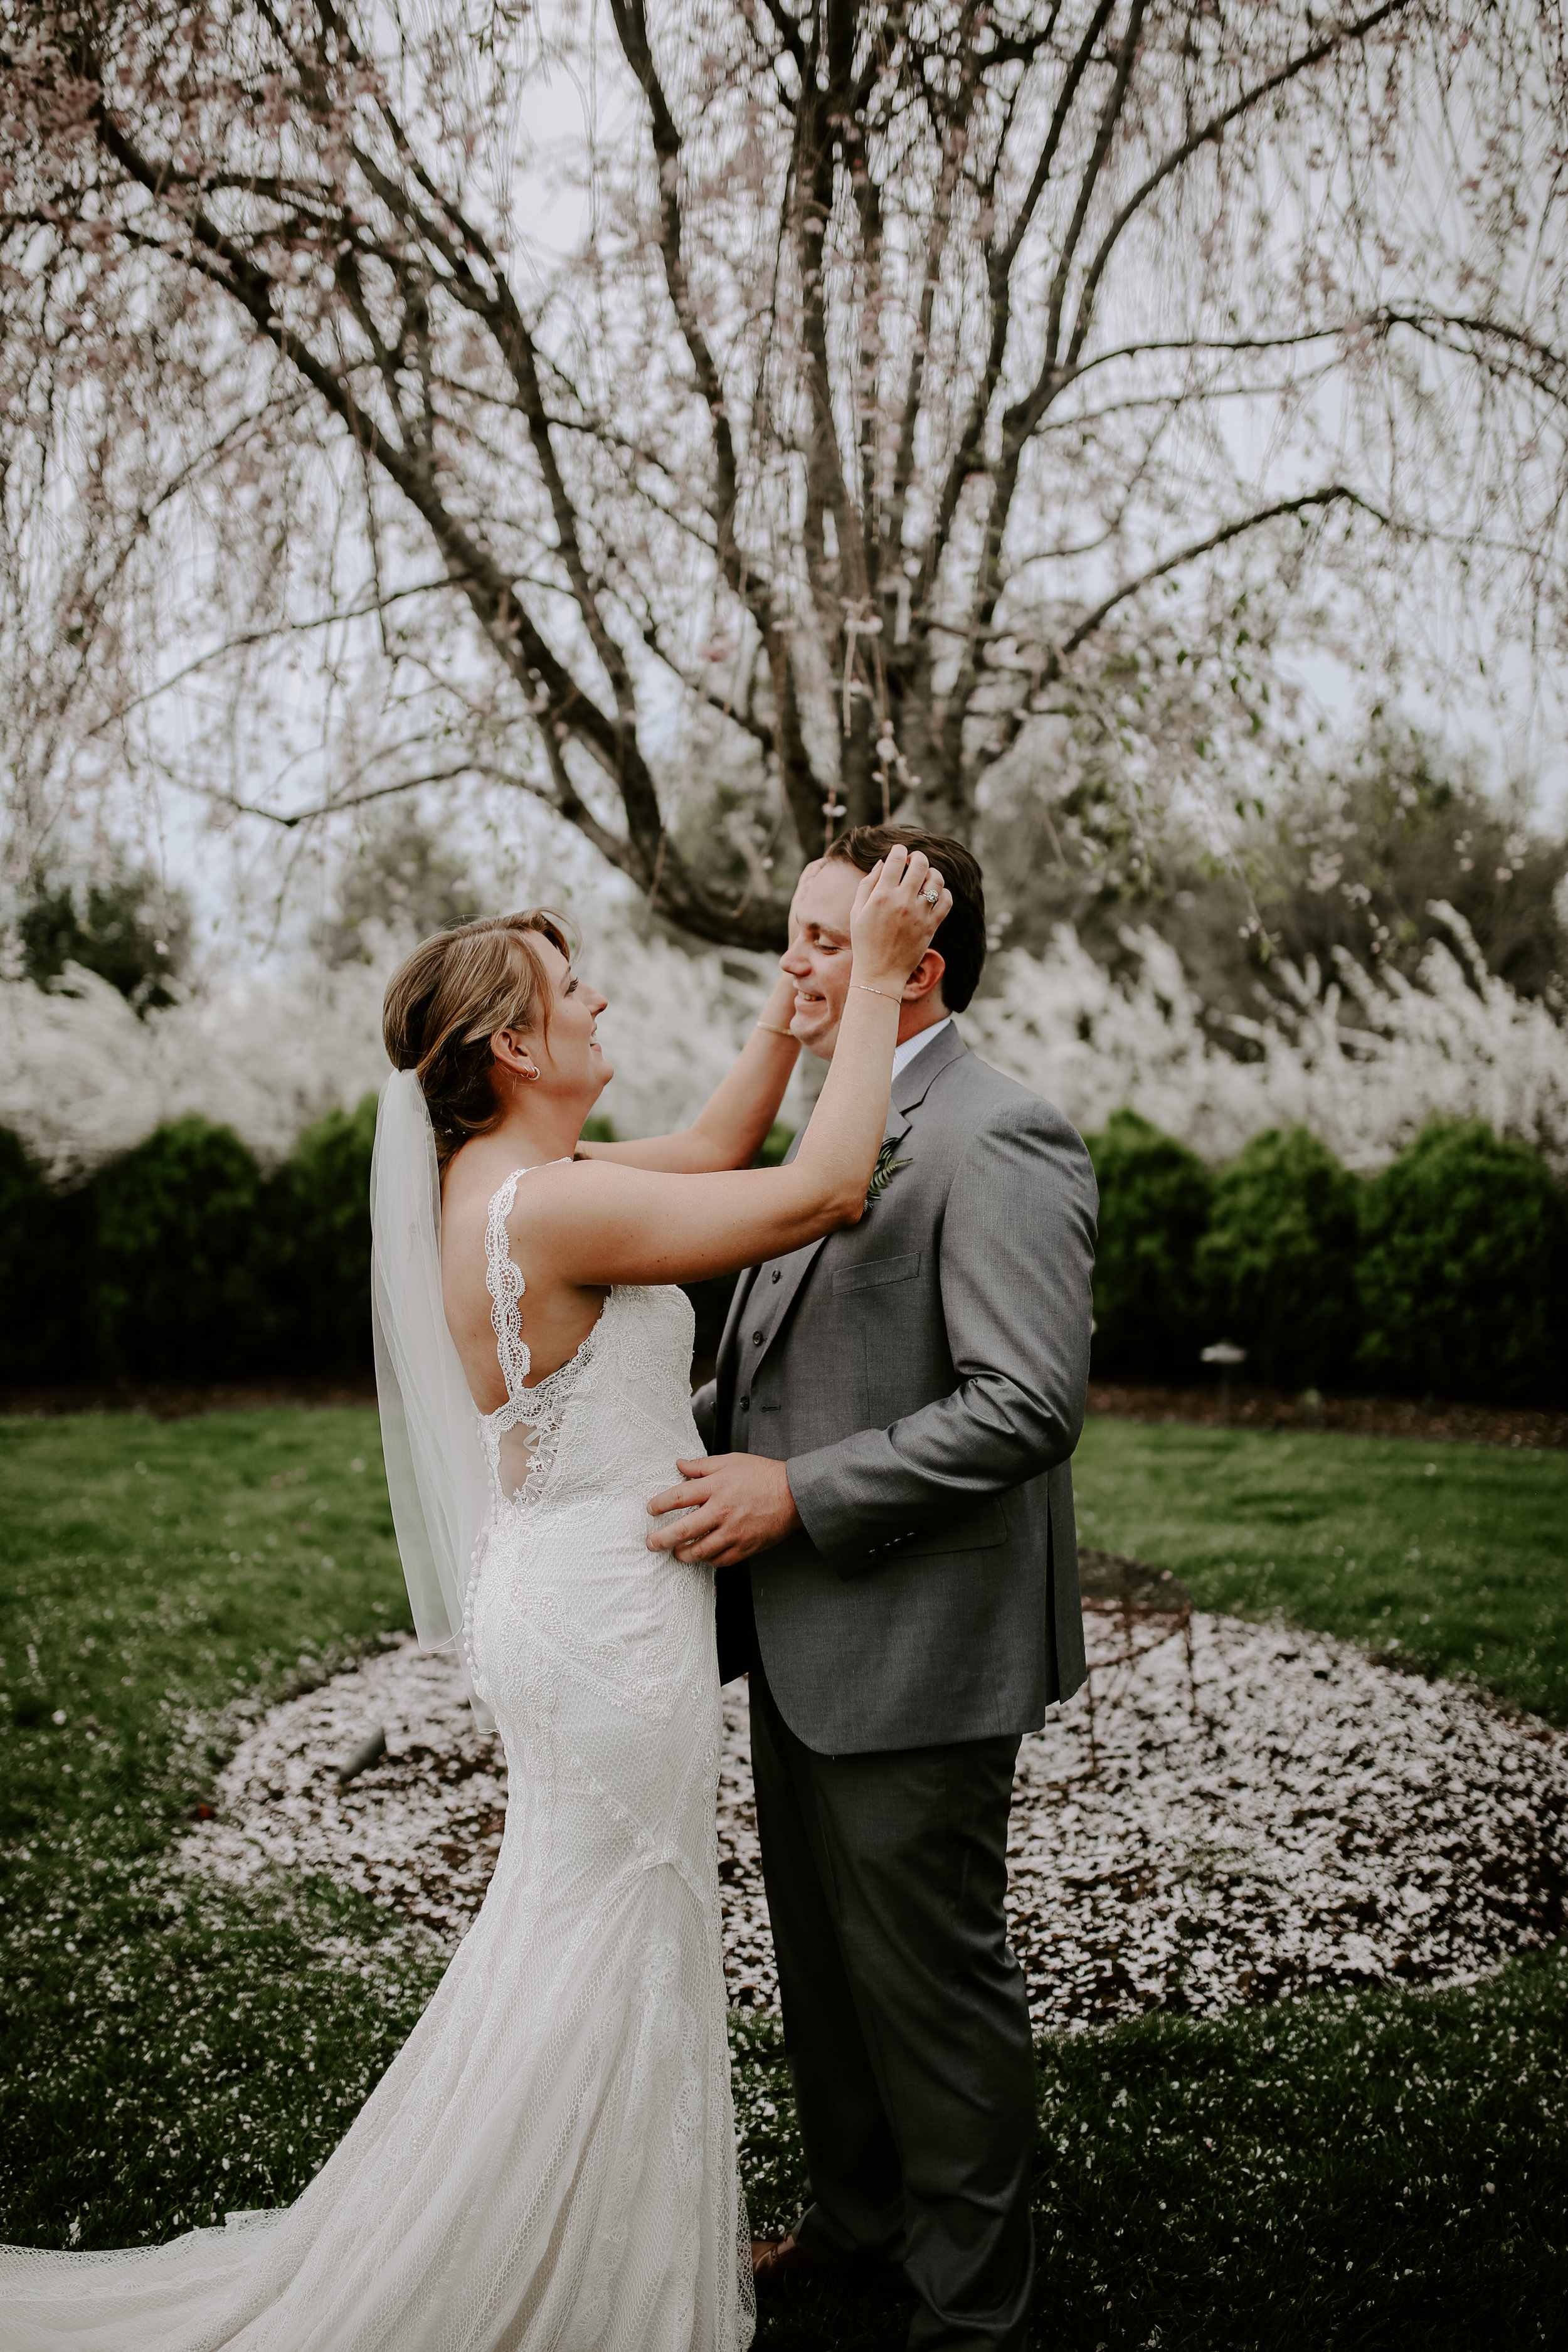 TheGreens_Married_2019-112.jpg